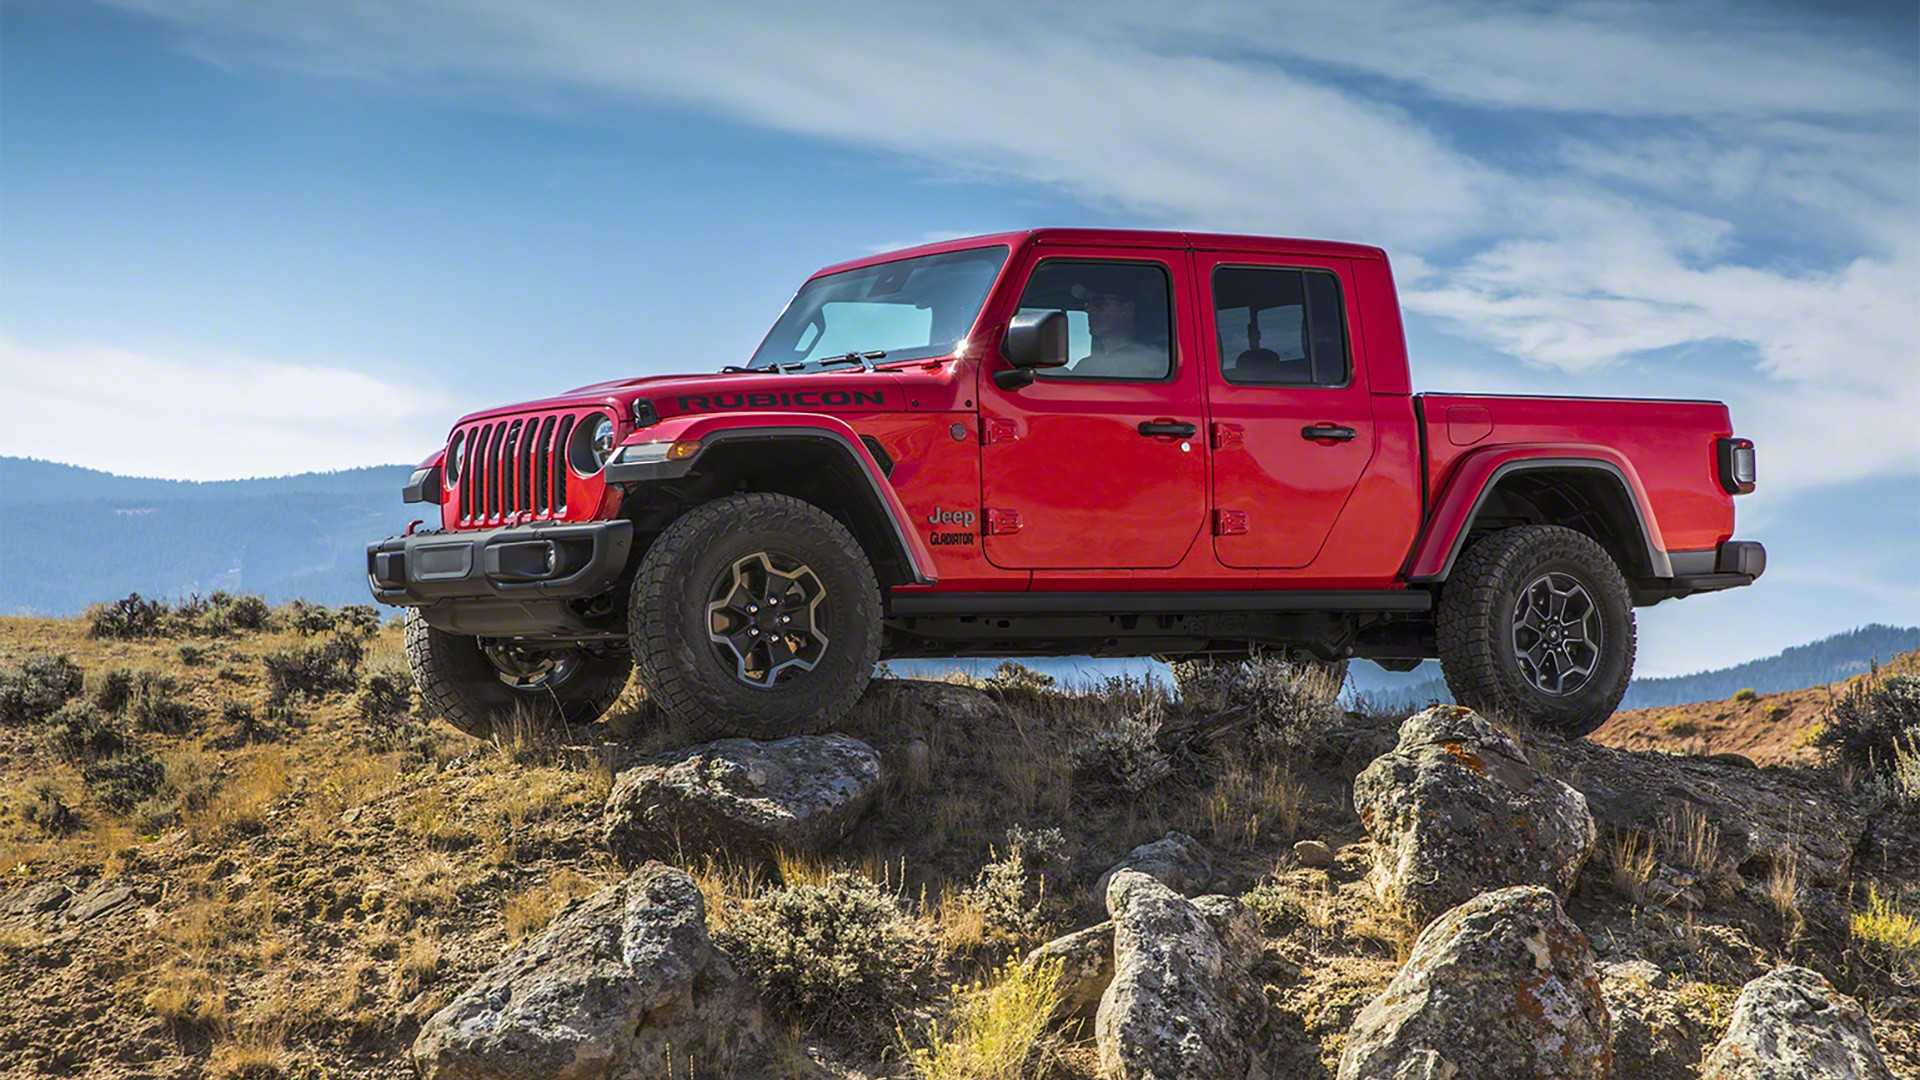 2020 Jeep Gladiator pickup truck